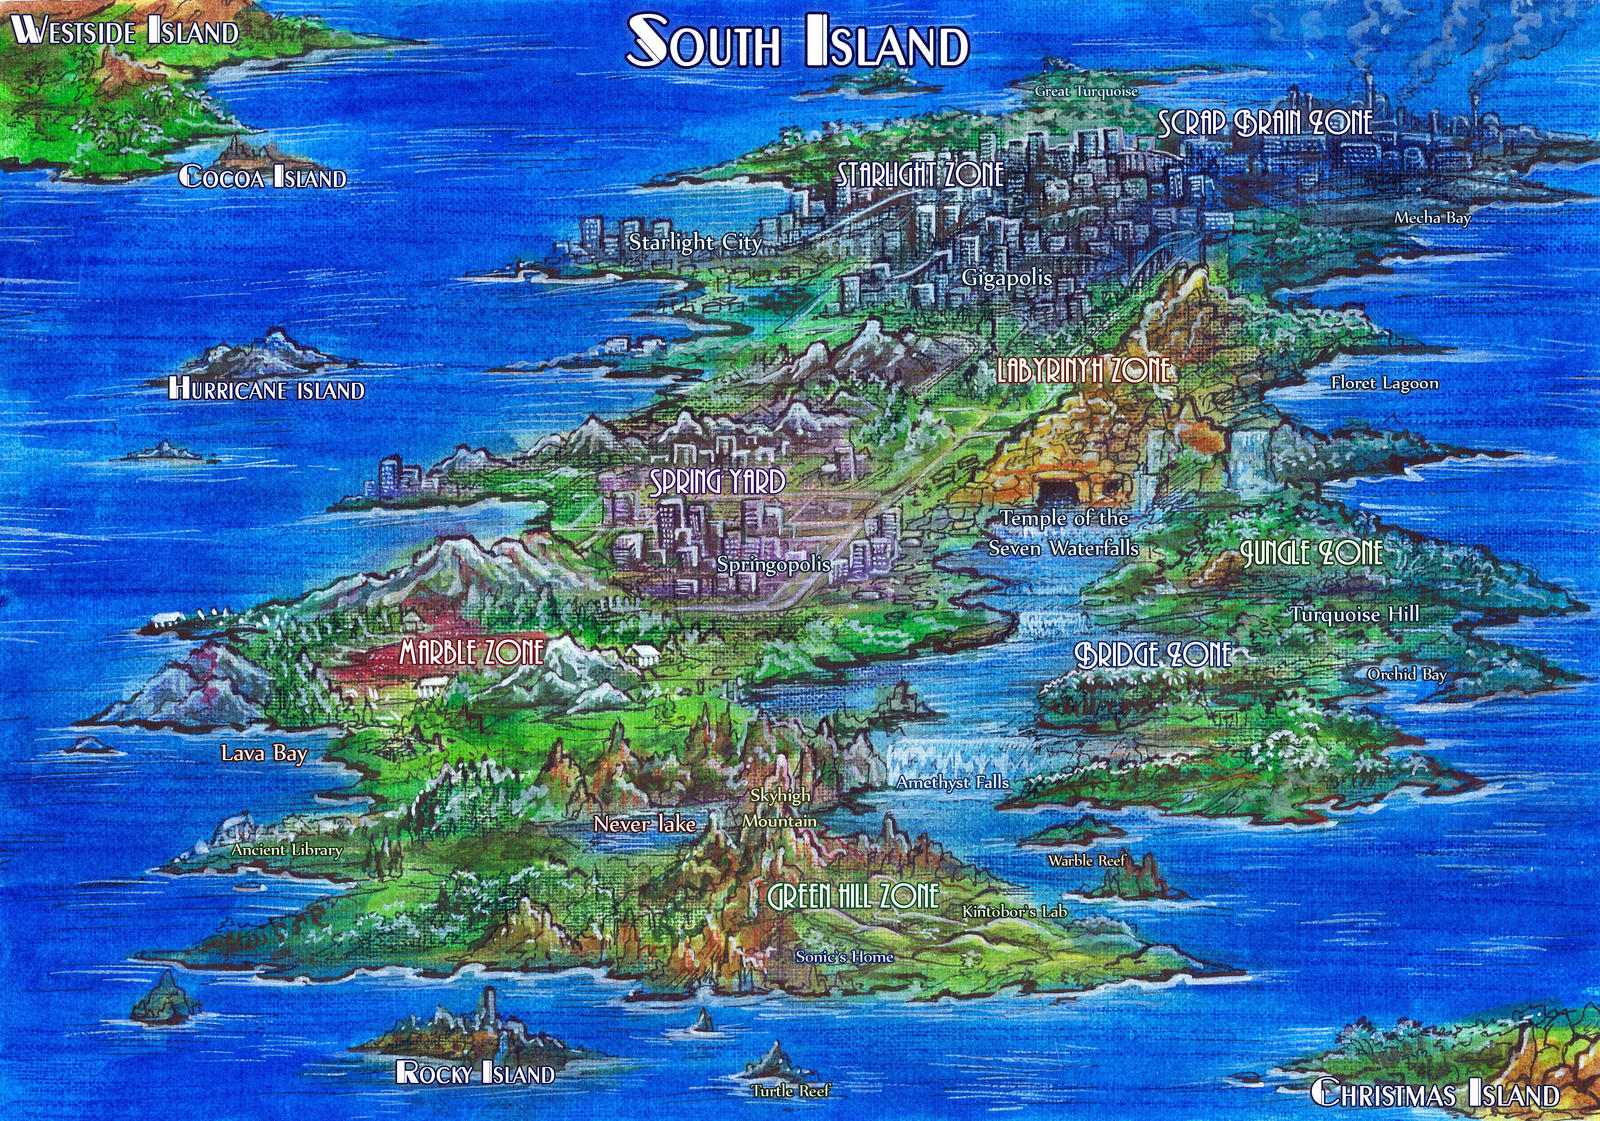 South Island - Map (Sonic ChotGH version) by Liris-san on DeviantArt